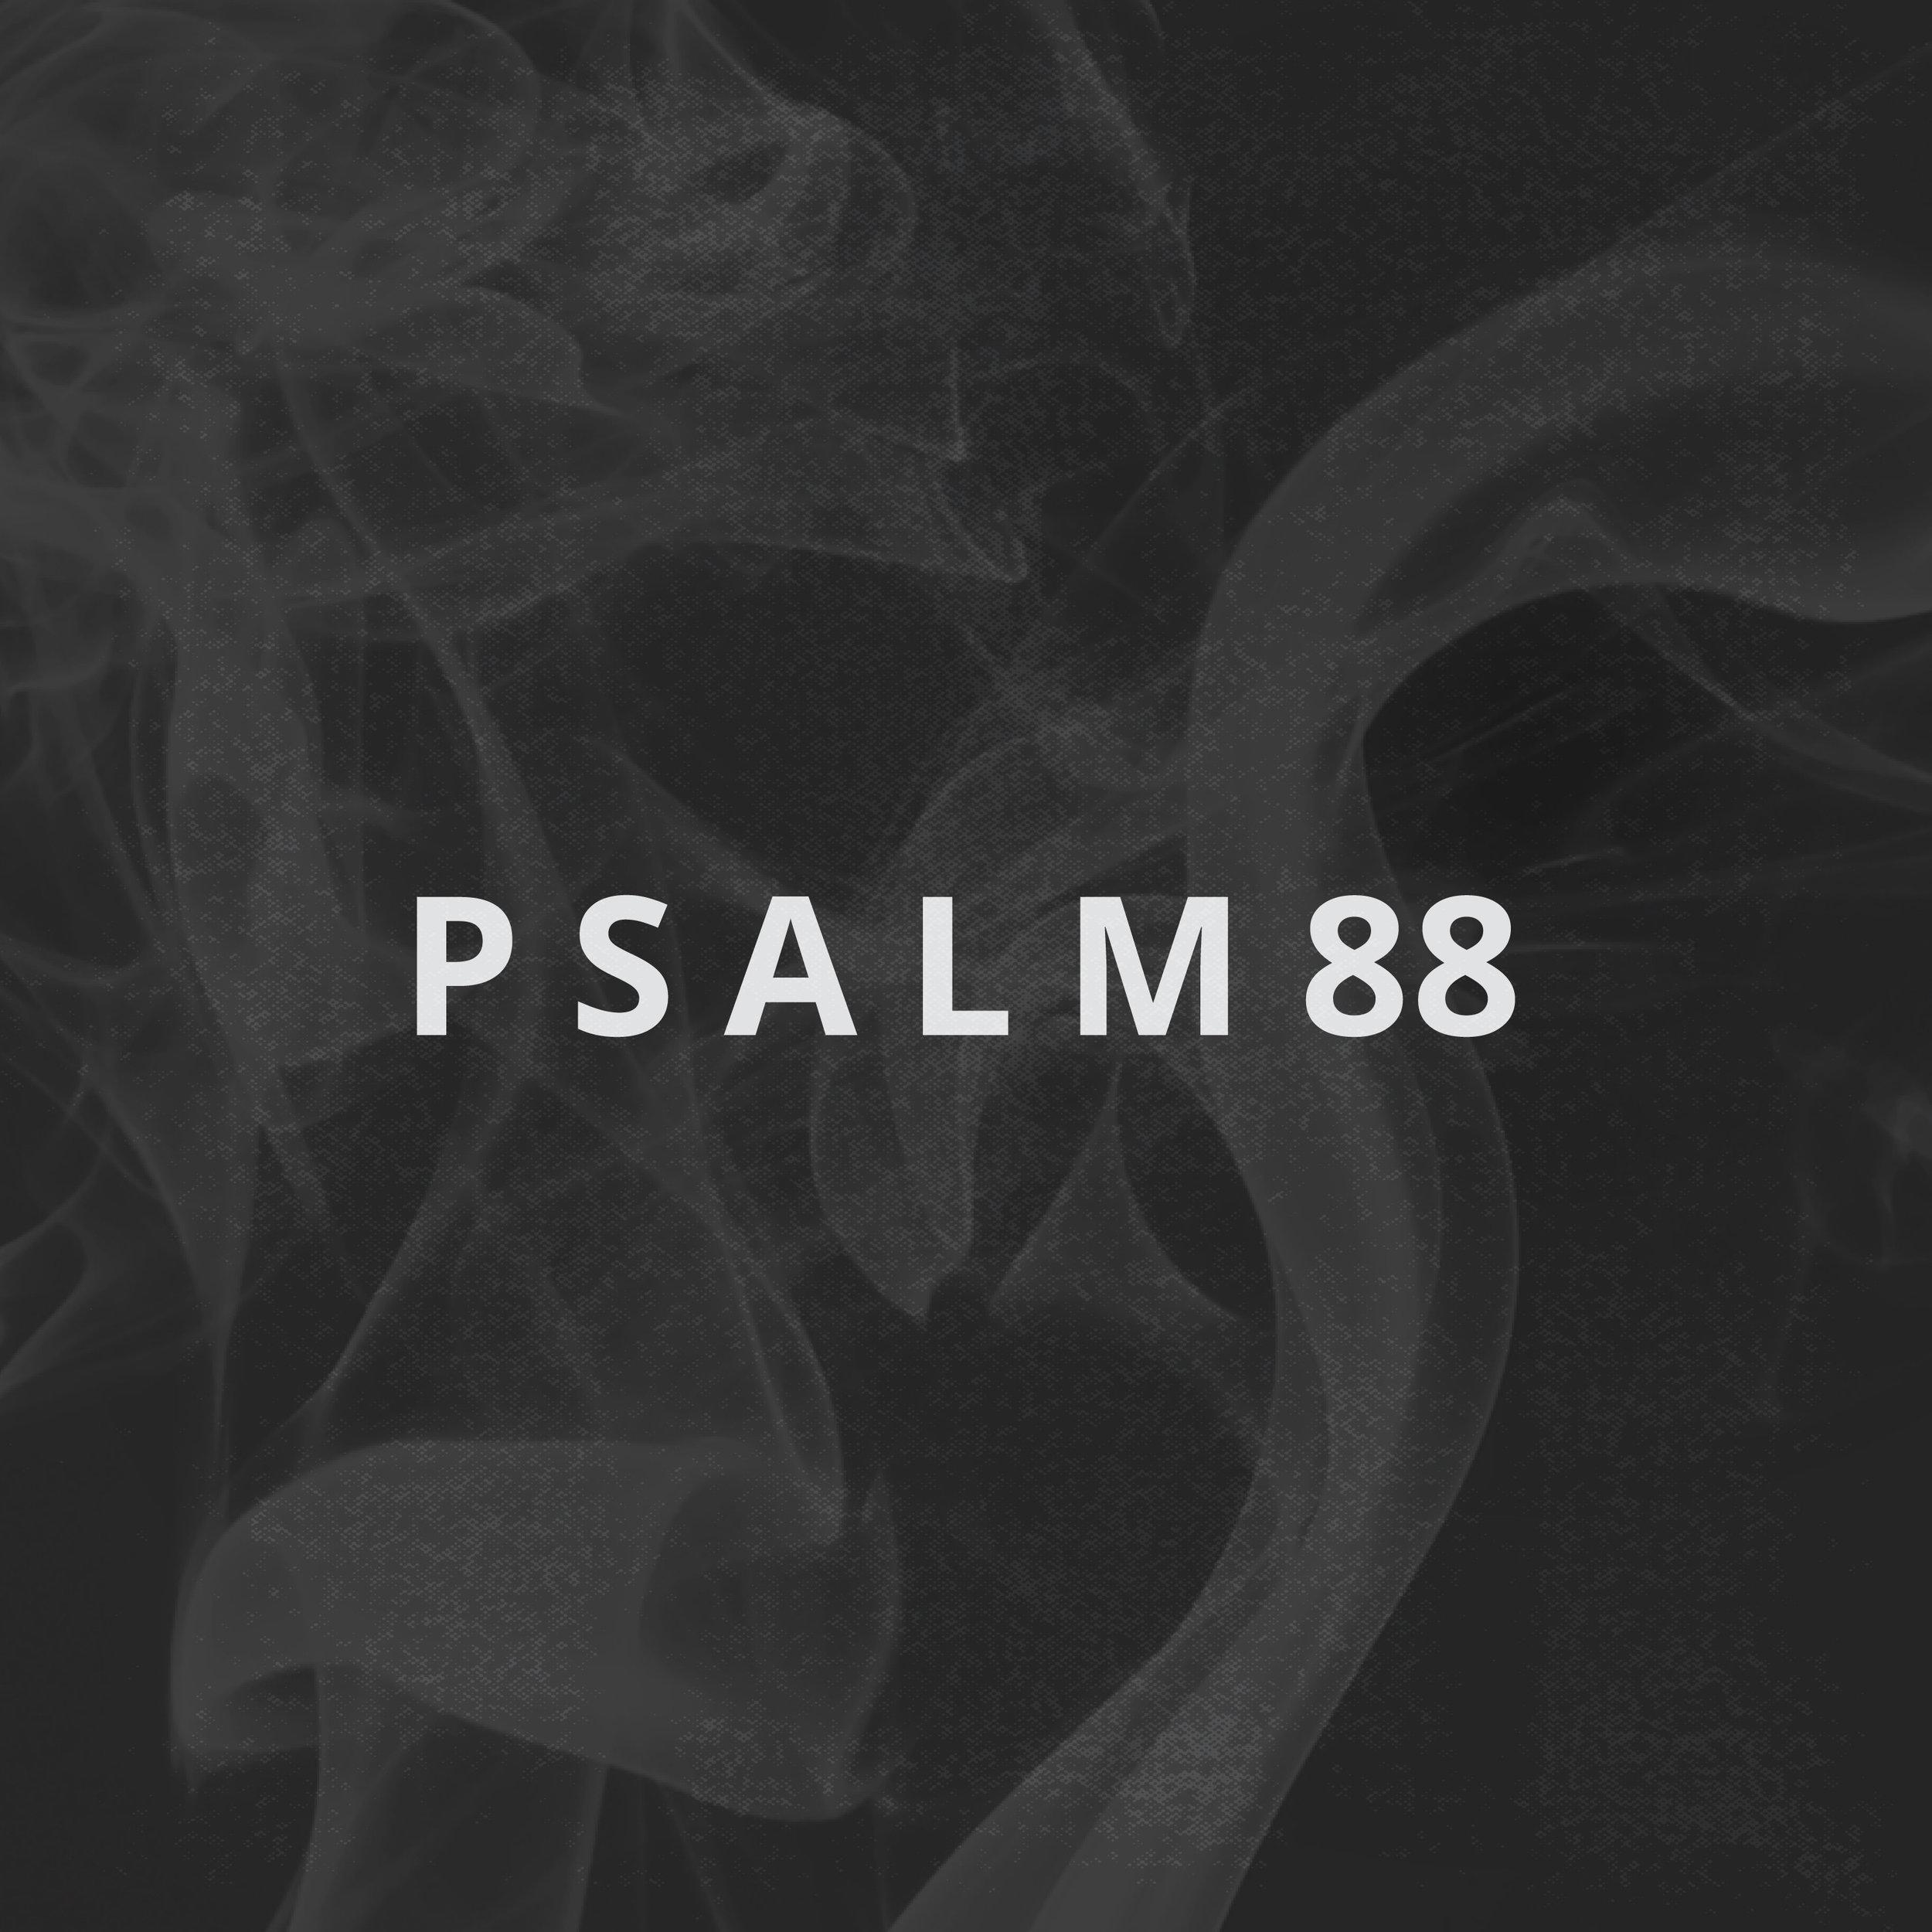 Psalm 88 4.jpg